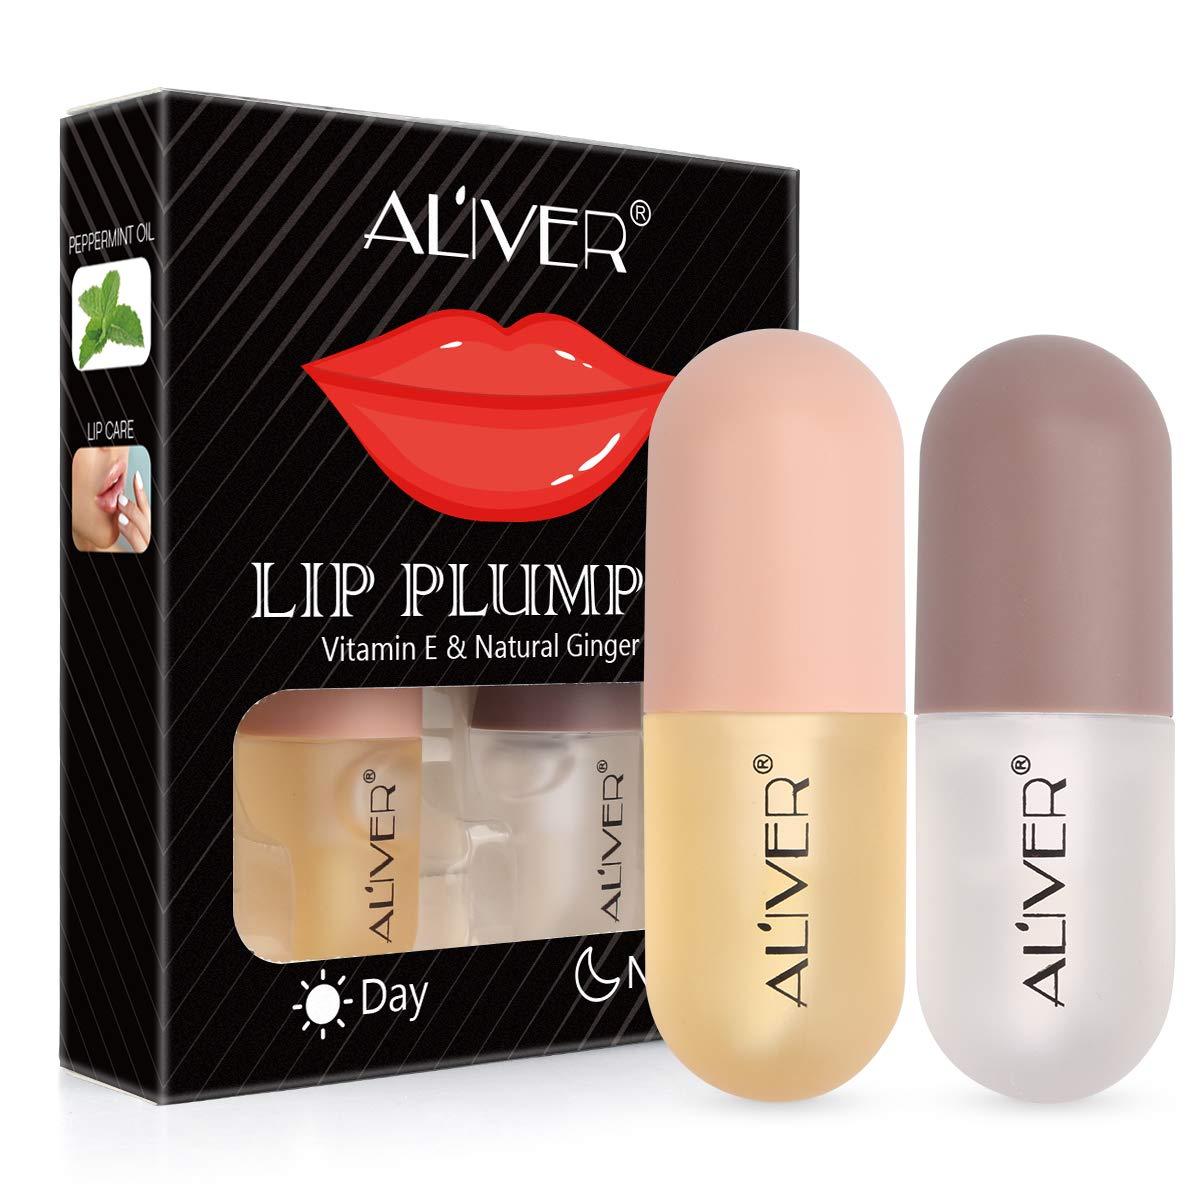 Lip Plumper Set, Natural Lip Plumper and Lip Care Serum, Lip Enhancer, Lip Plumping Balm, Moisturizing Clear Lip Gloss for Fuller Lips & Hydrated Beauty Lips